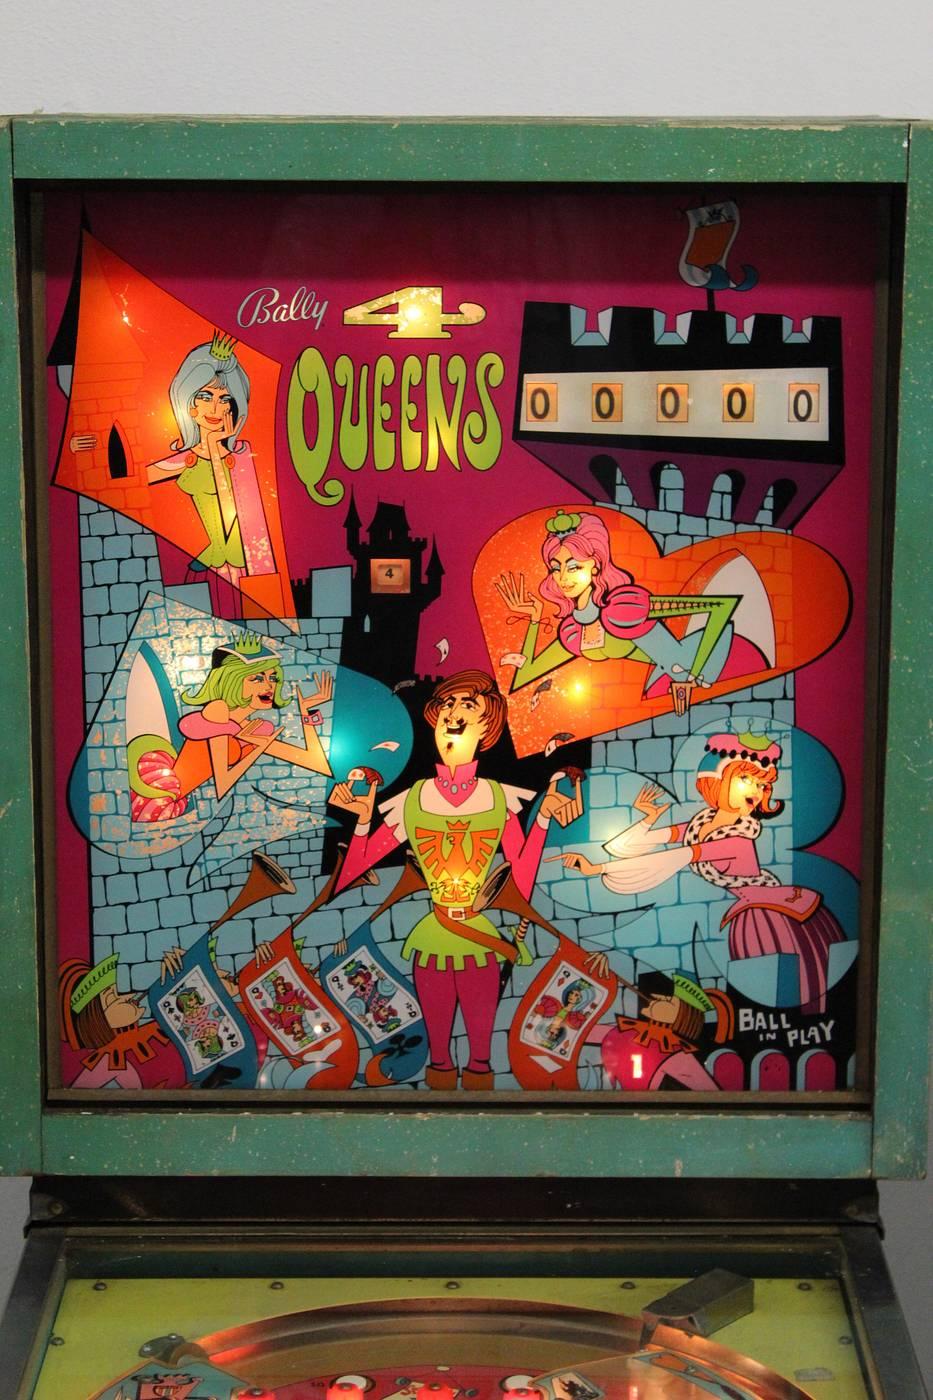 new york innovative design best value For sale: 4 Queens (Bally, 1970) - for sale   Pinside Market